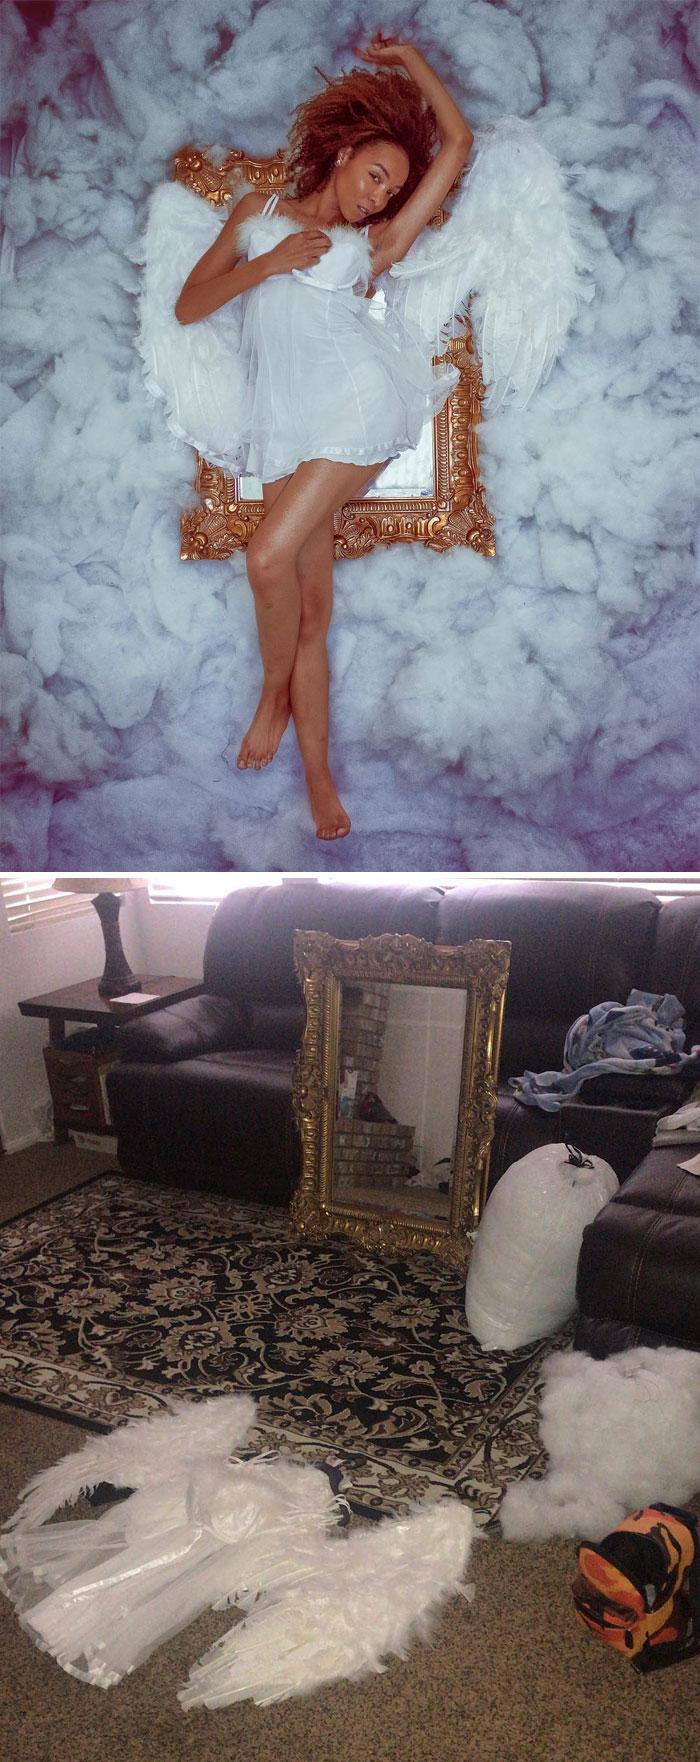 5d7f3c27c9239 photo shoot behind the scenes kimberly douglas 55 5d7a295e43849  700 - Modelo tira auto-retratos muito interessante